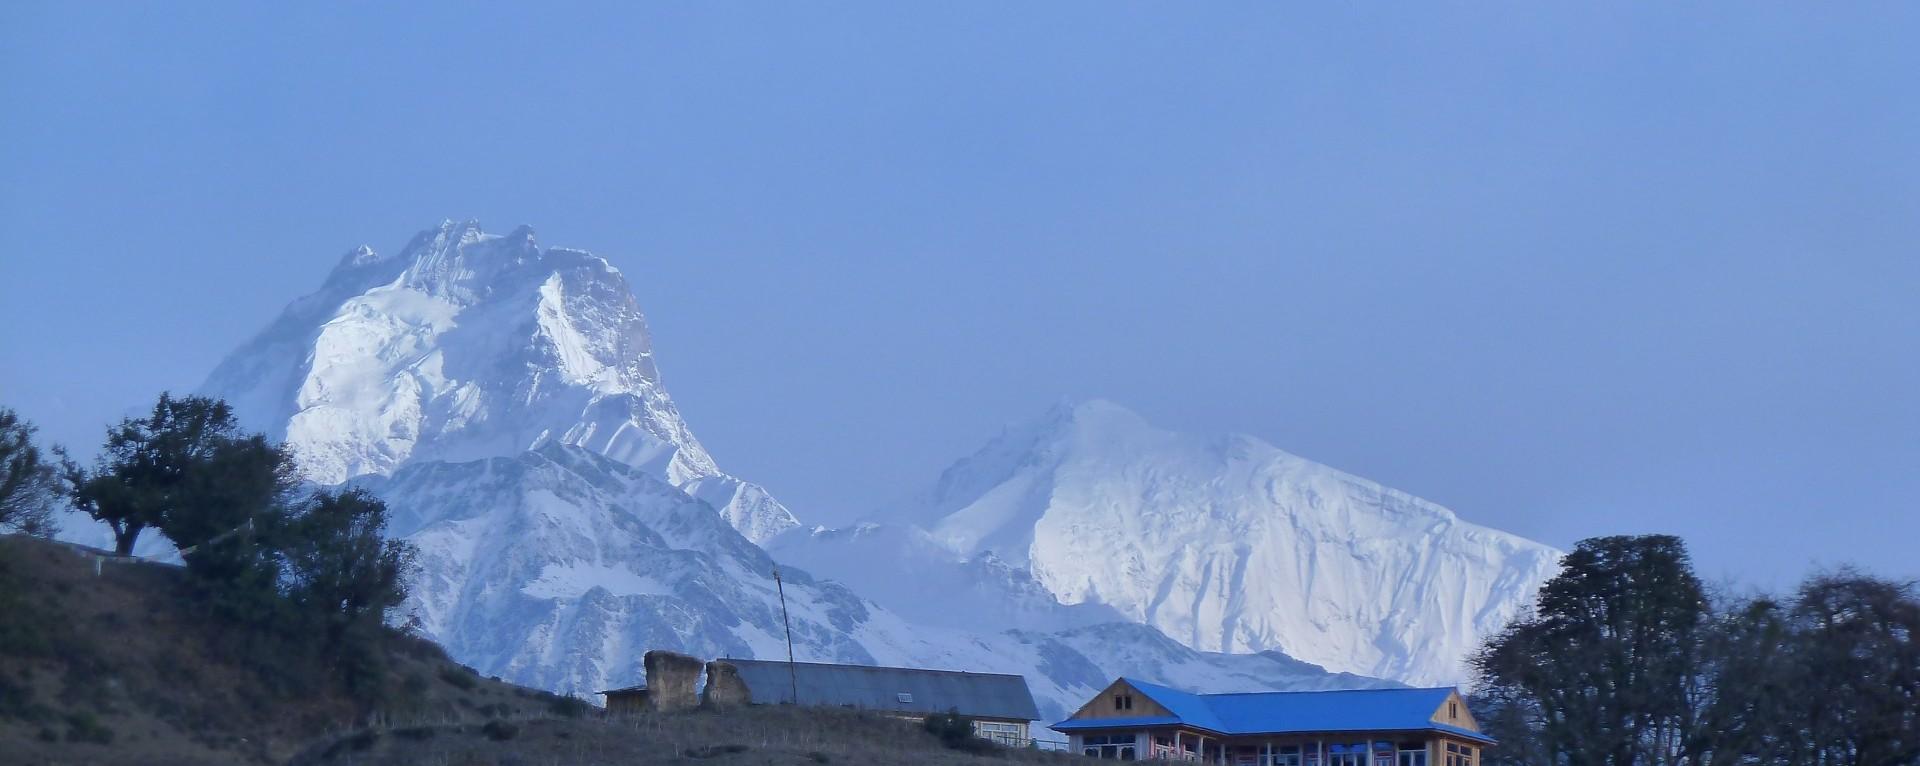 The view of Ganesh himal ranges from Nagthali.